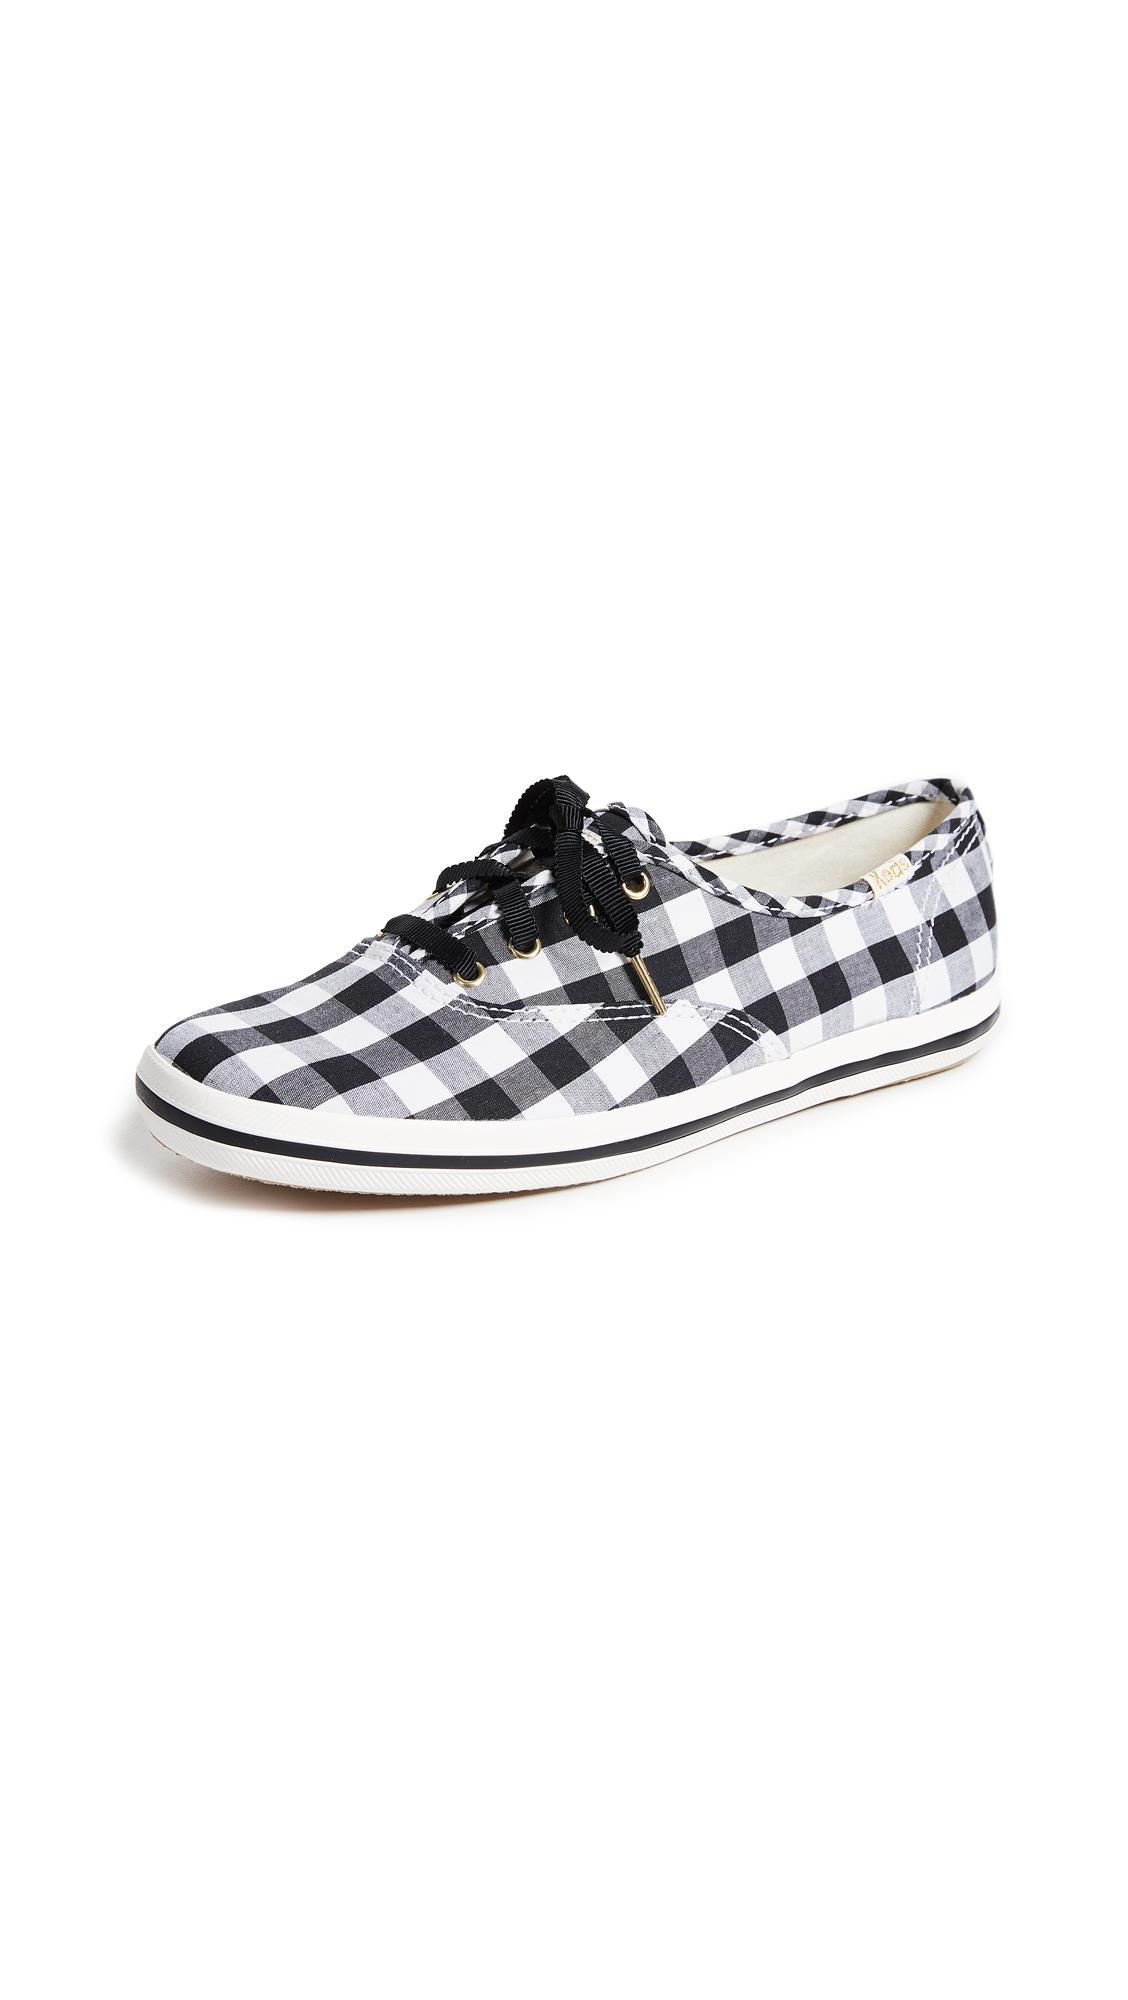 3b6b49c6d03 Keds X Kate Spade New York Gingham Sneakers In Black